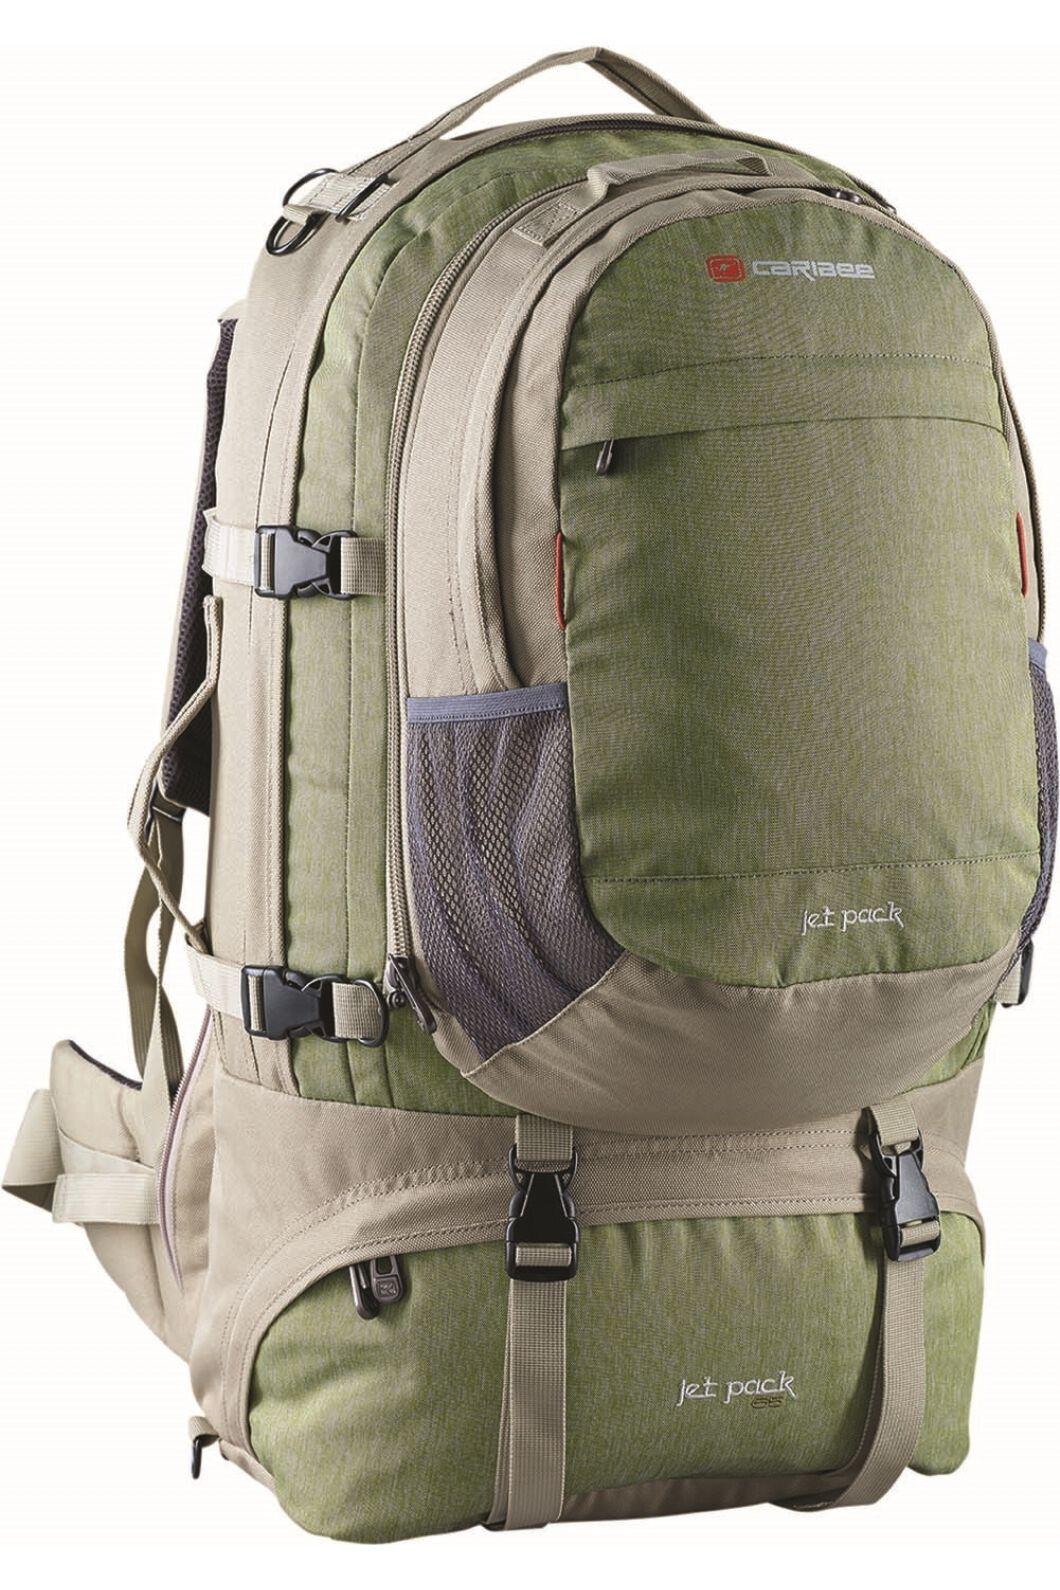 Caribee Jet Pack Travel Pack 65L, None, hi-res